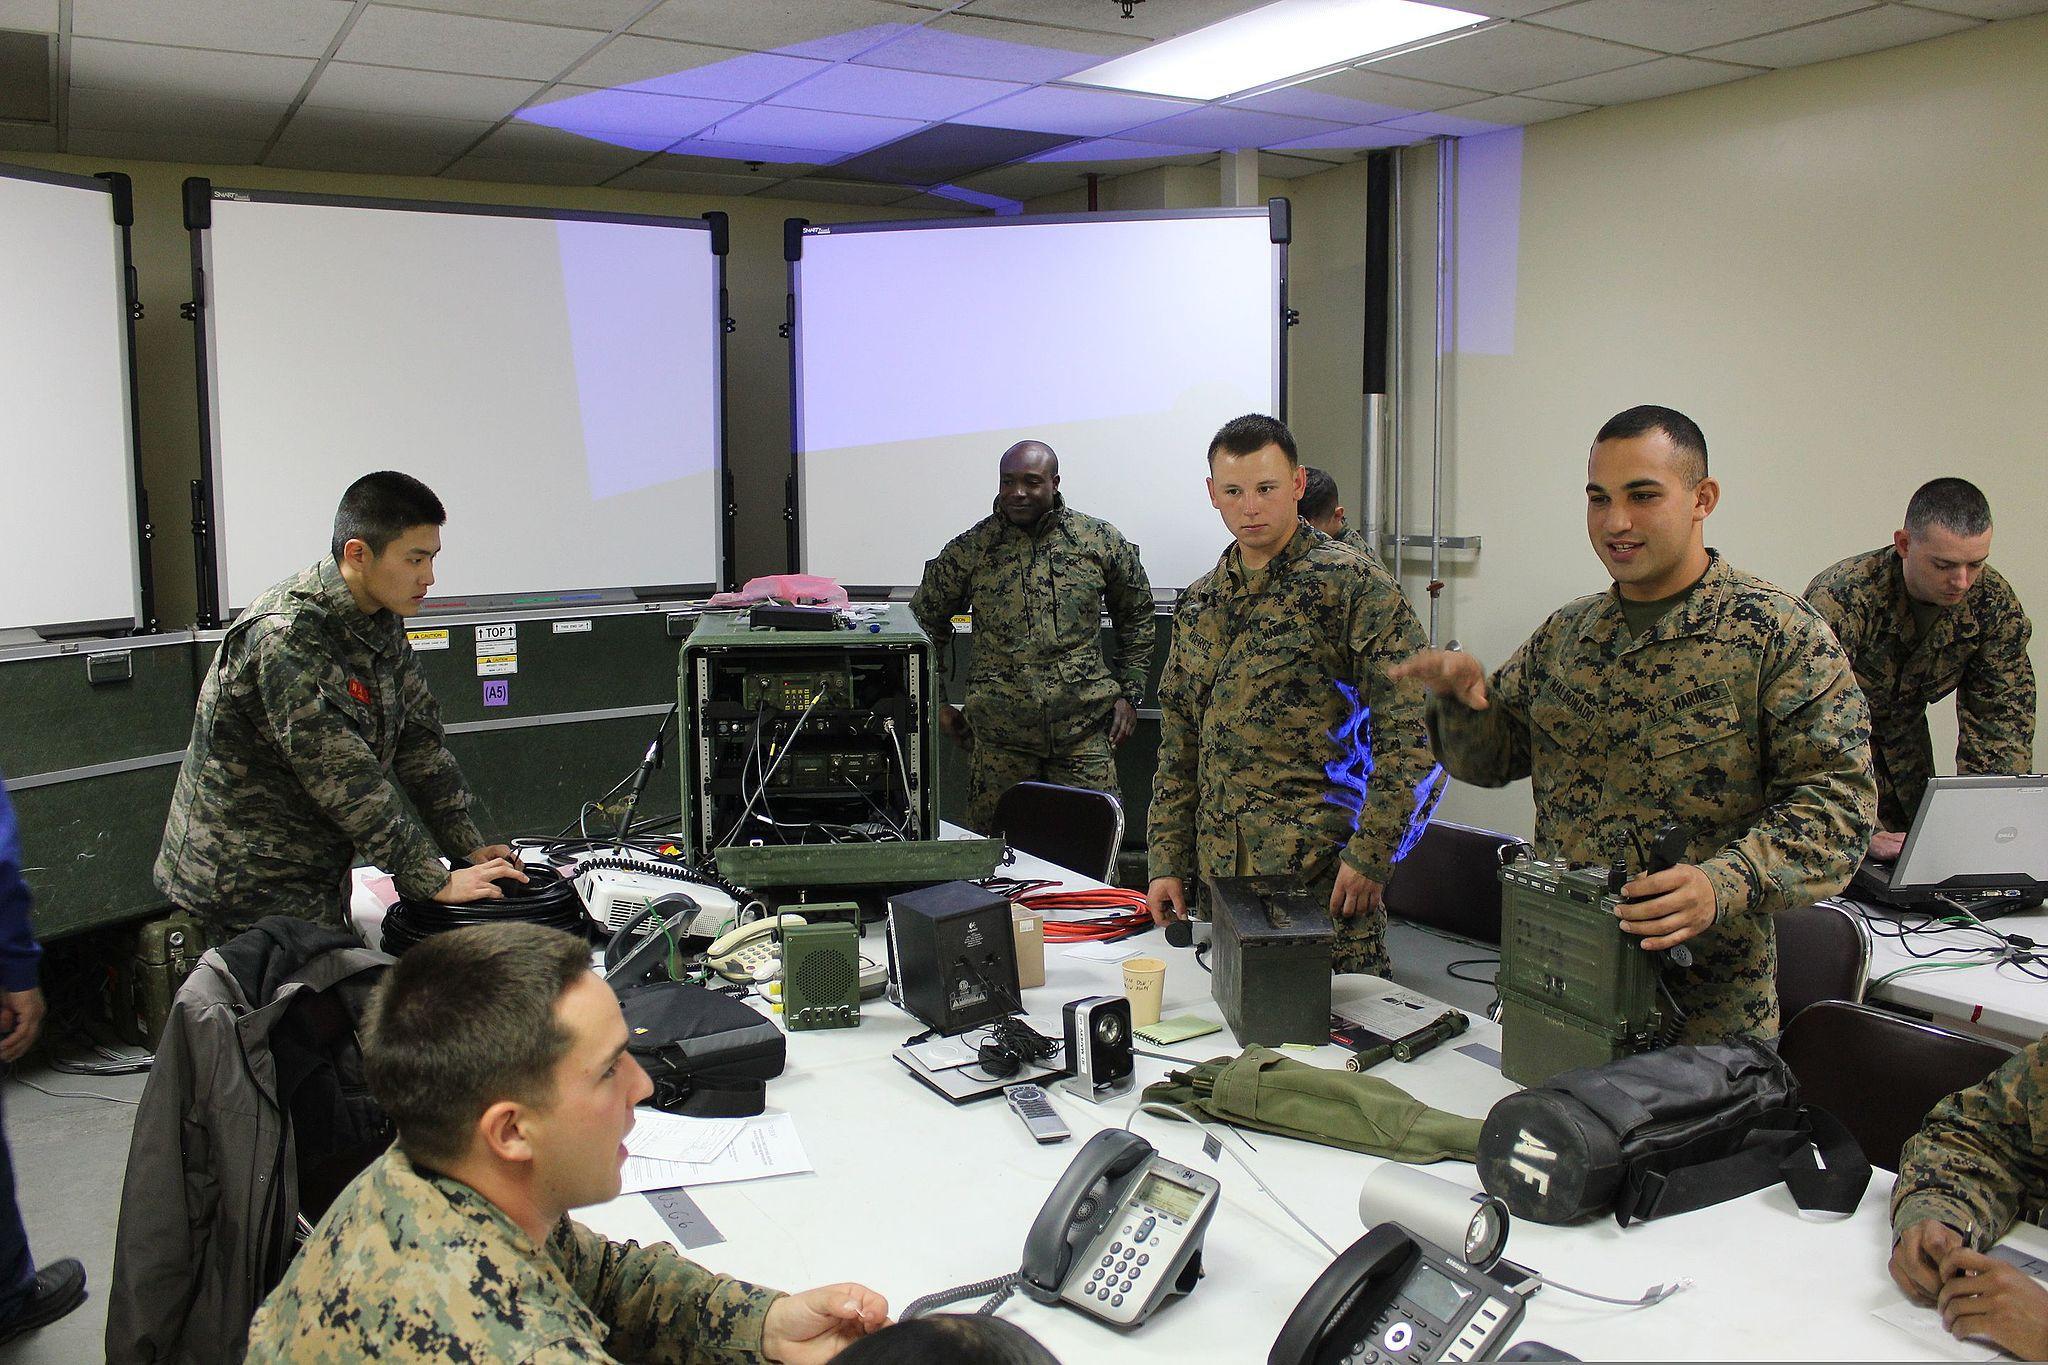 Marine Jobs -- MOS 0203 Ground Intelligence Officer